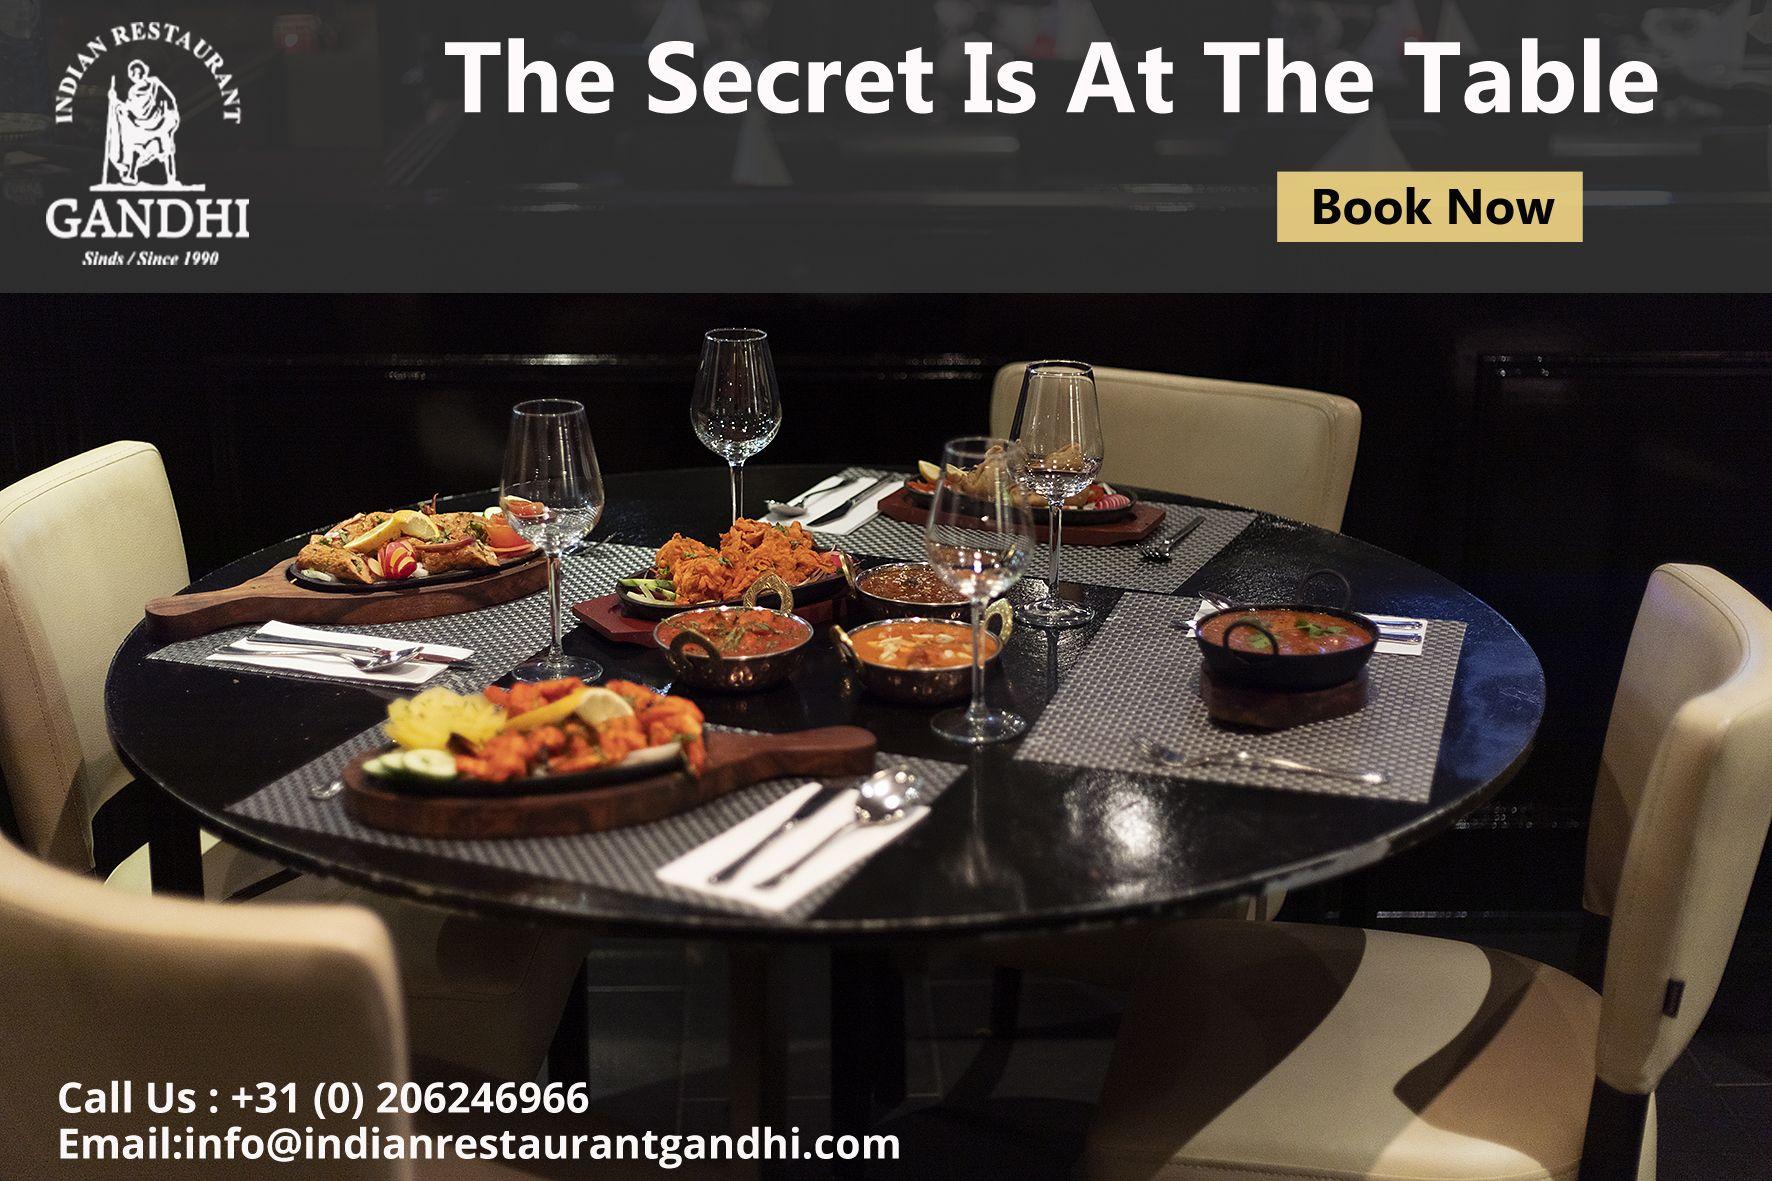 The Secret Is At The Table Book Now Indianfood Foodie Food Foodporn Foodphotography Instafood Foodblogger Foodgasm Met Afbeeldingen